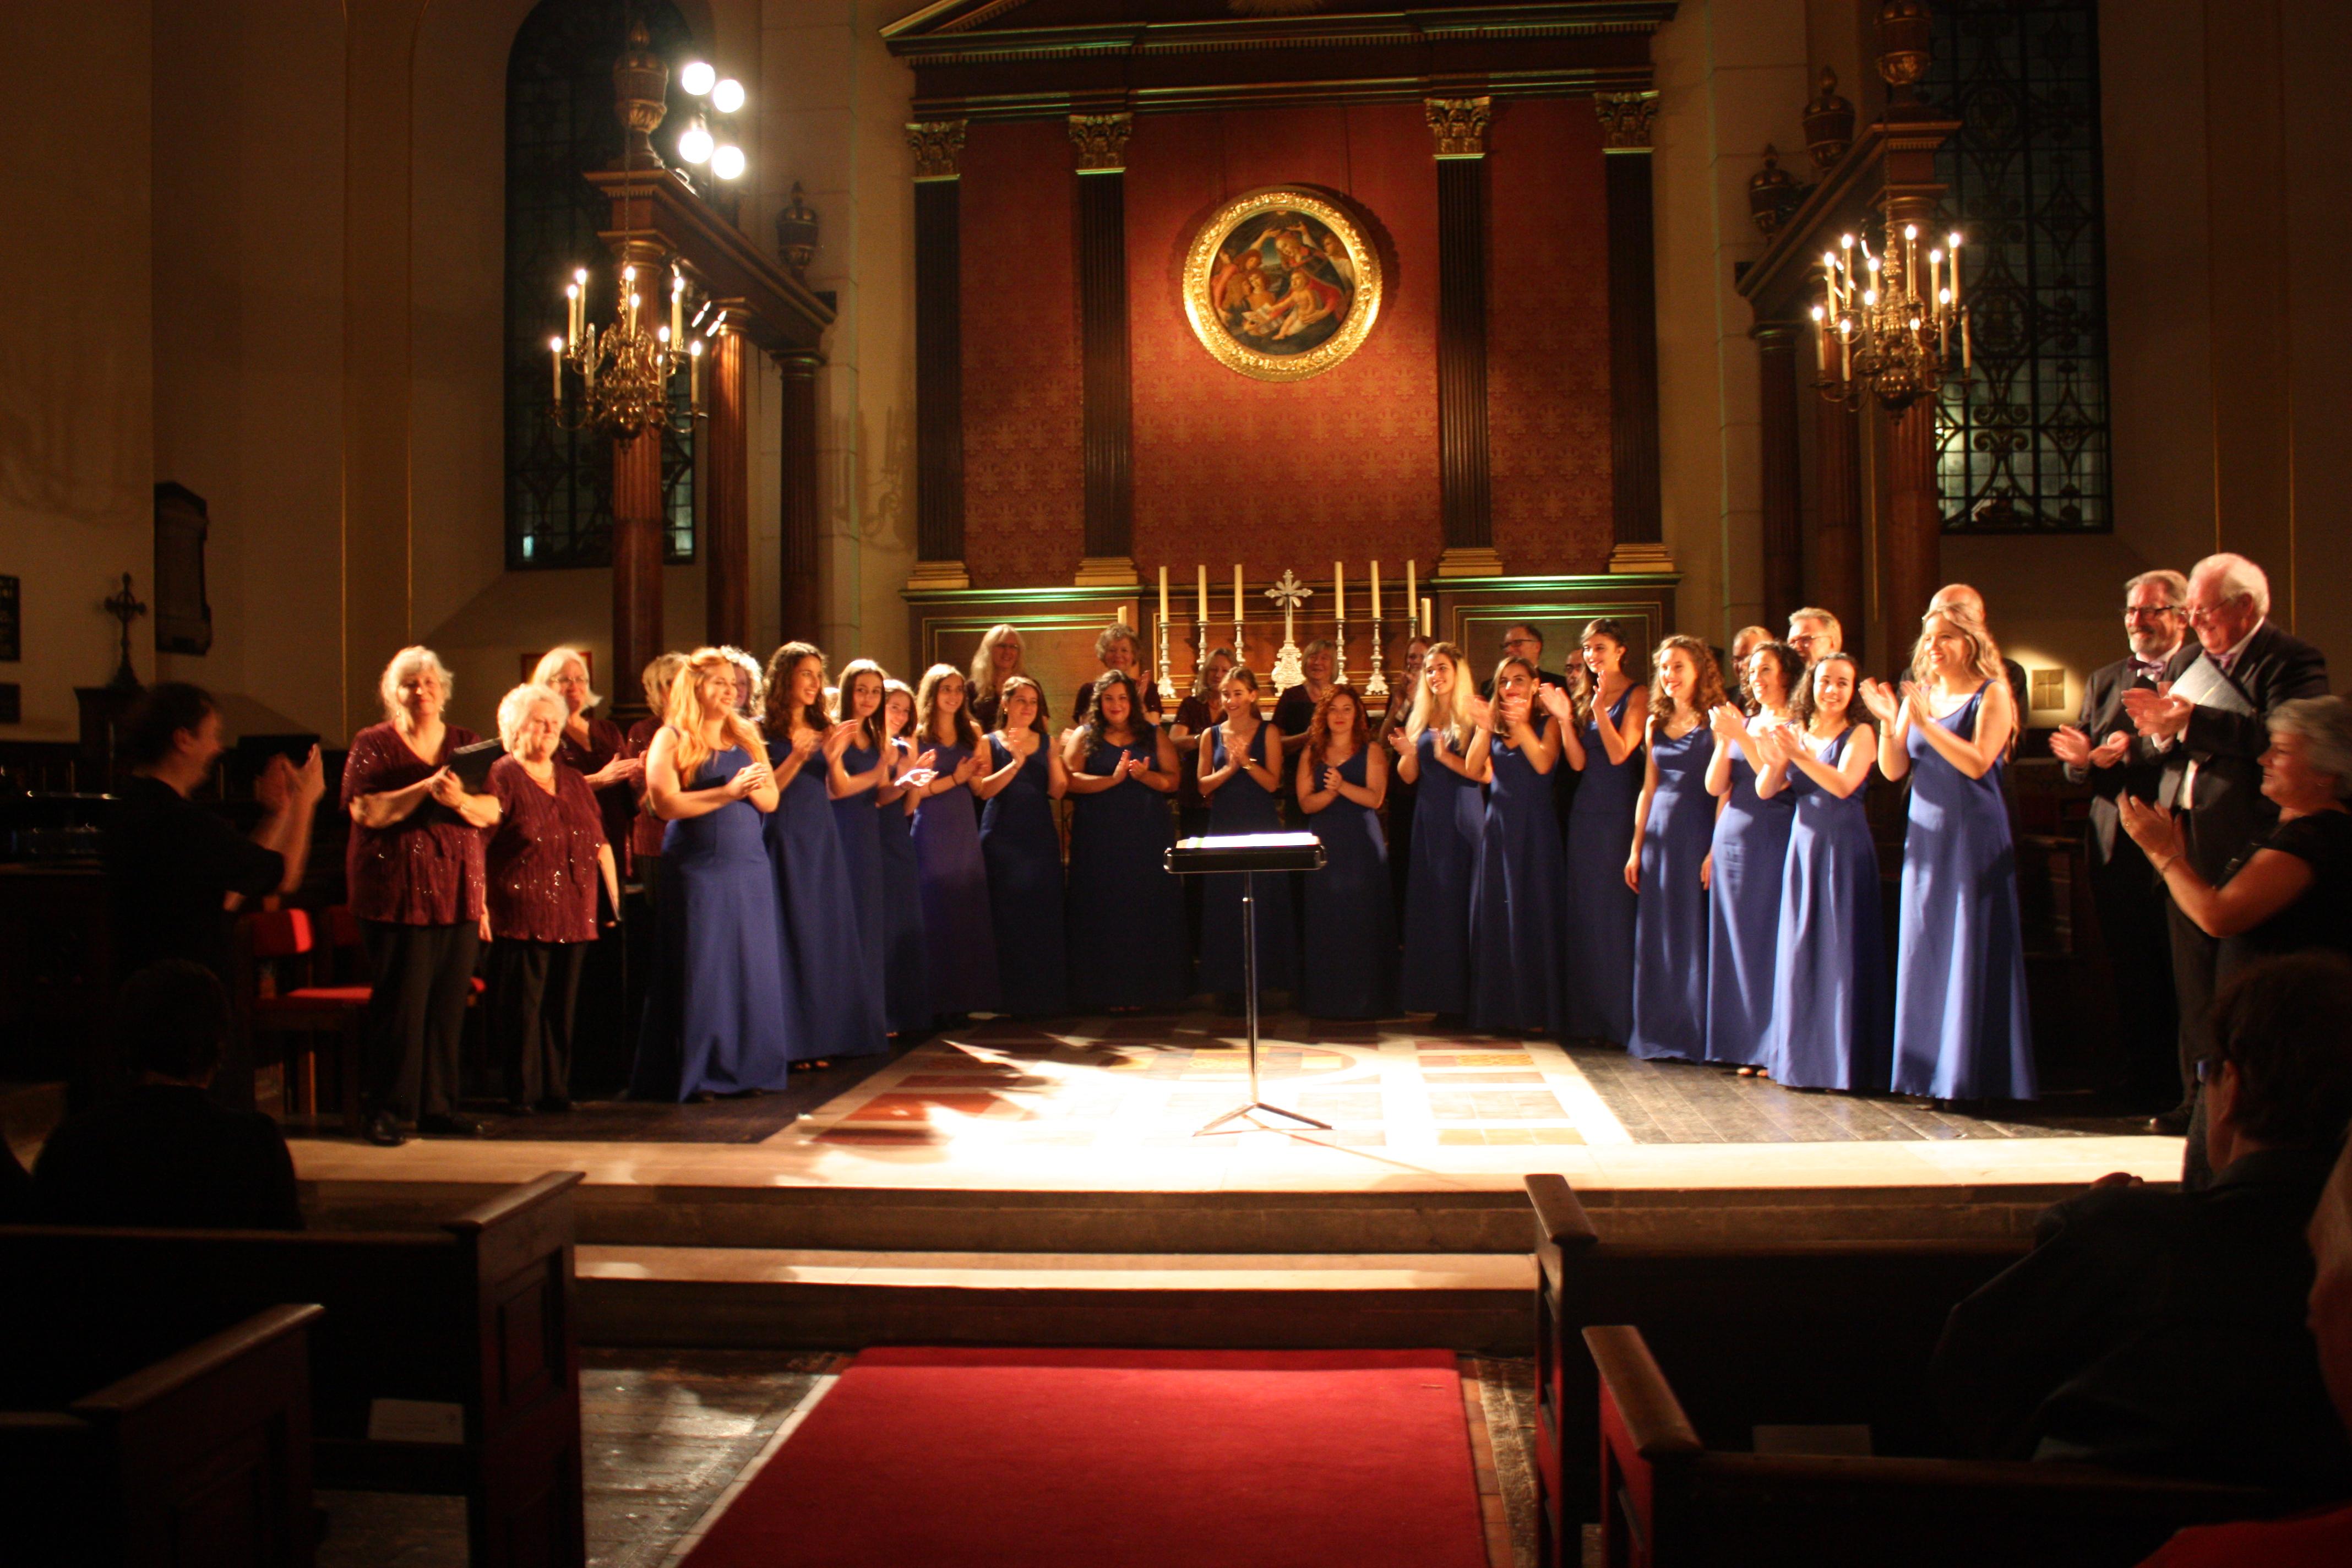 joint-choirs-brandenburg